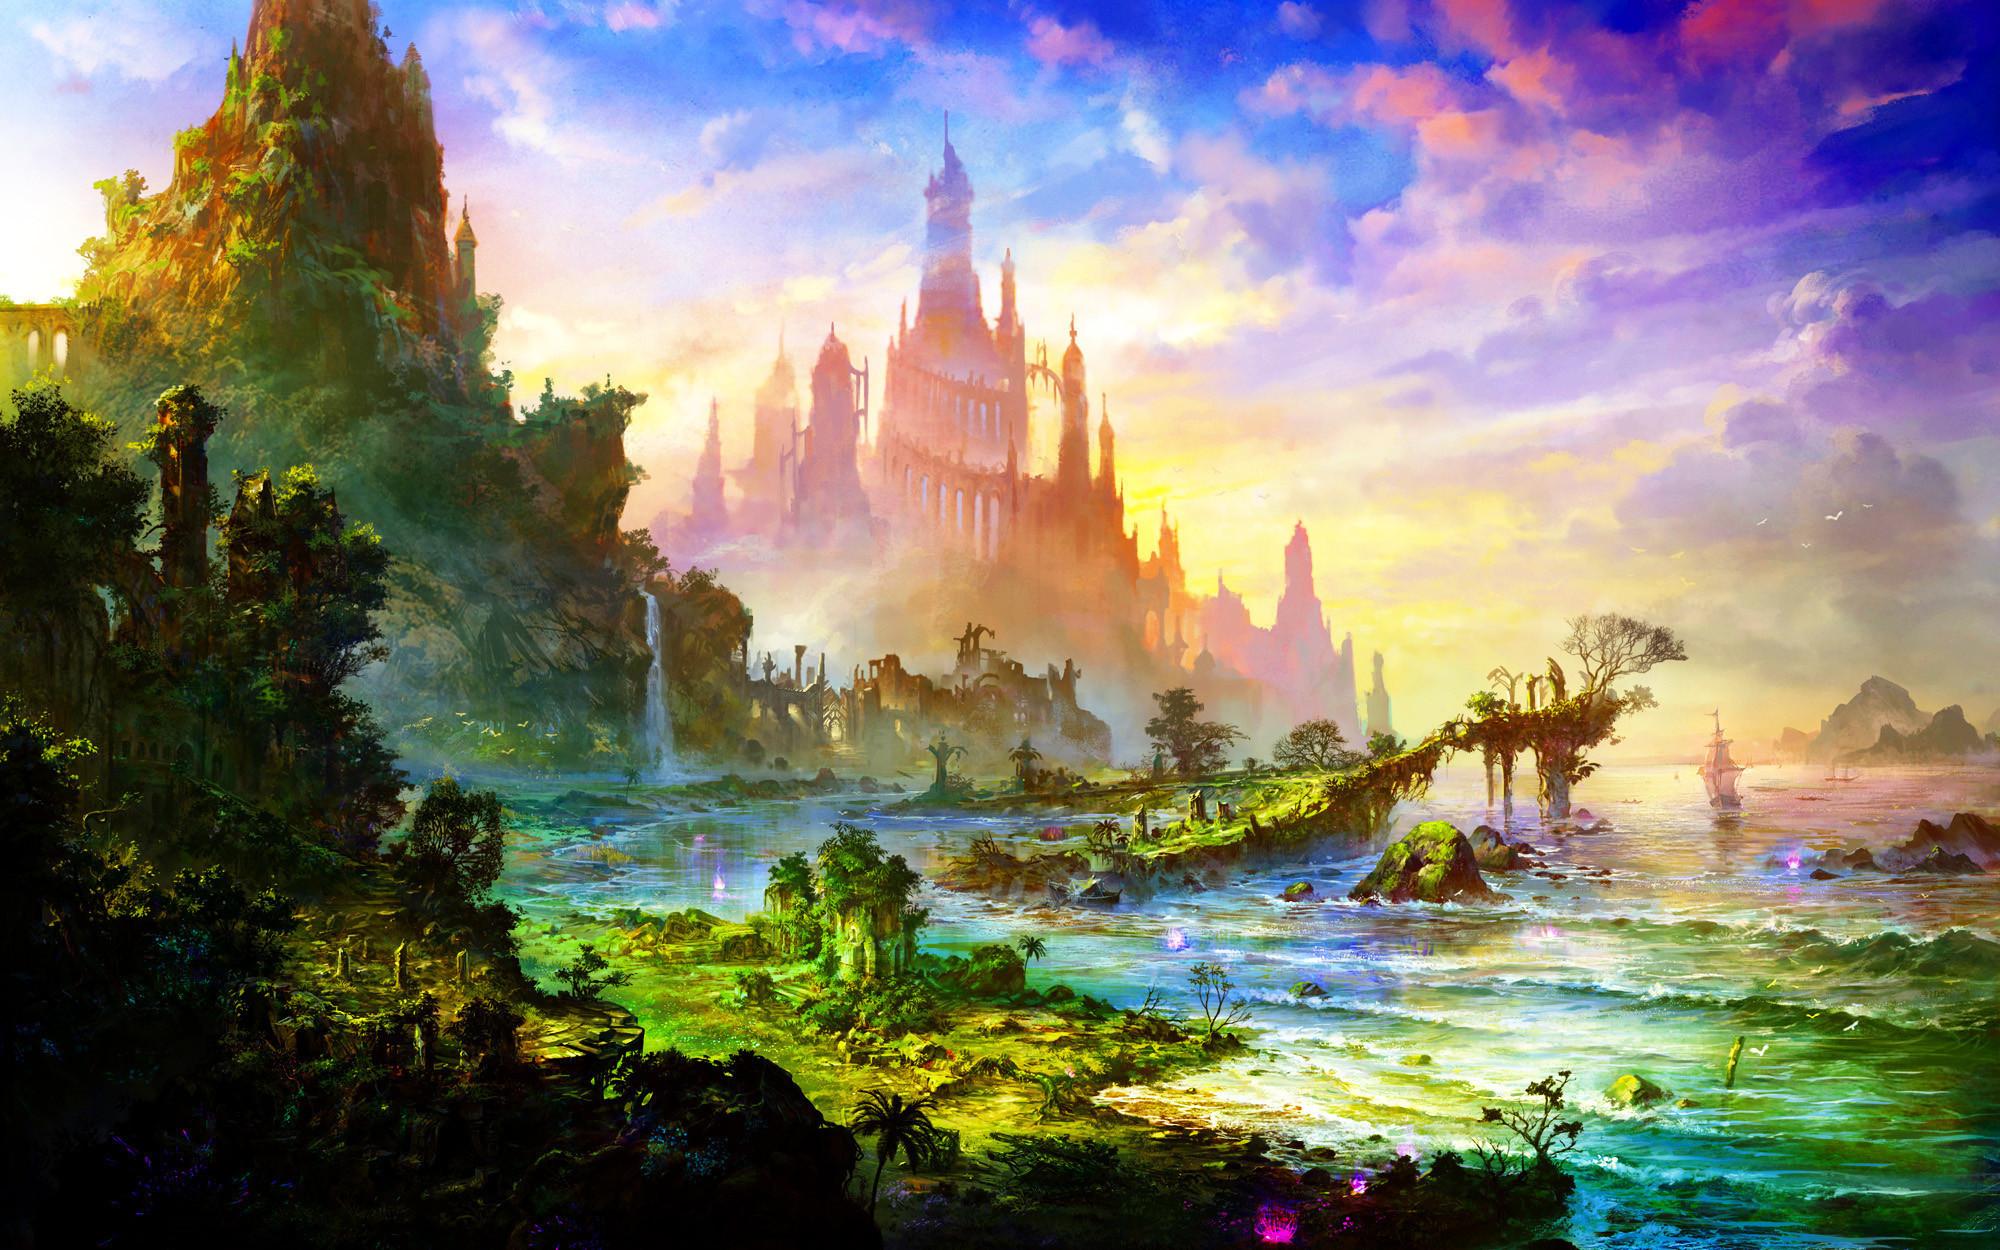 Res: 2000x1250,  Space/Fantasy Wallpaper Set 78